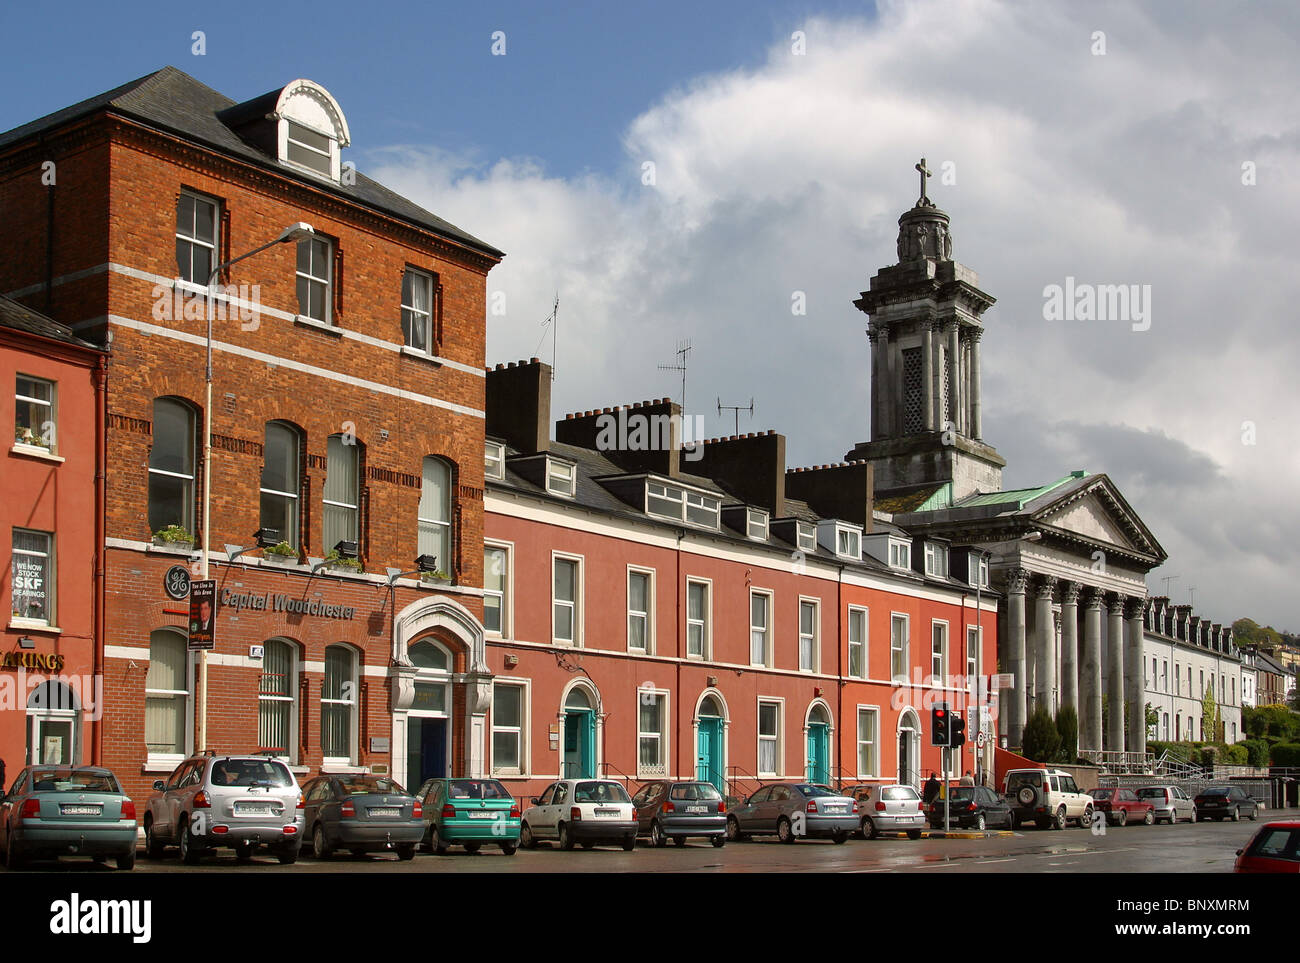 Cork City Libraries: Home